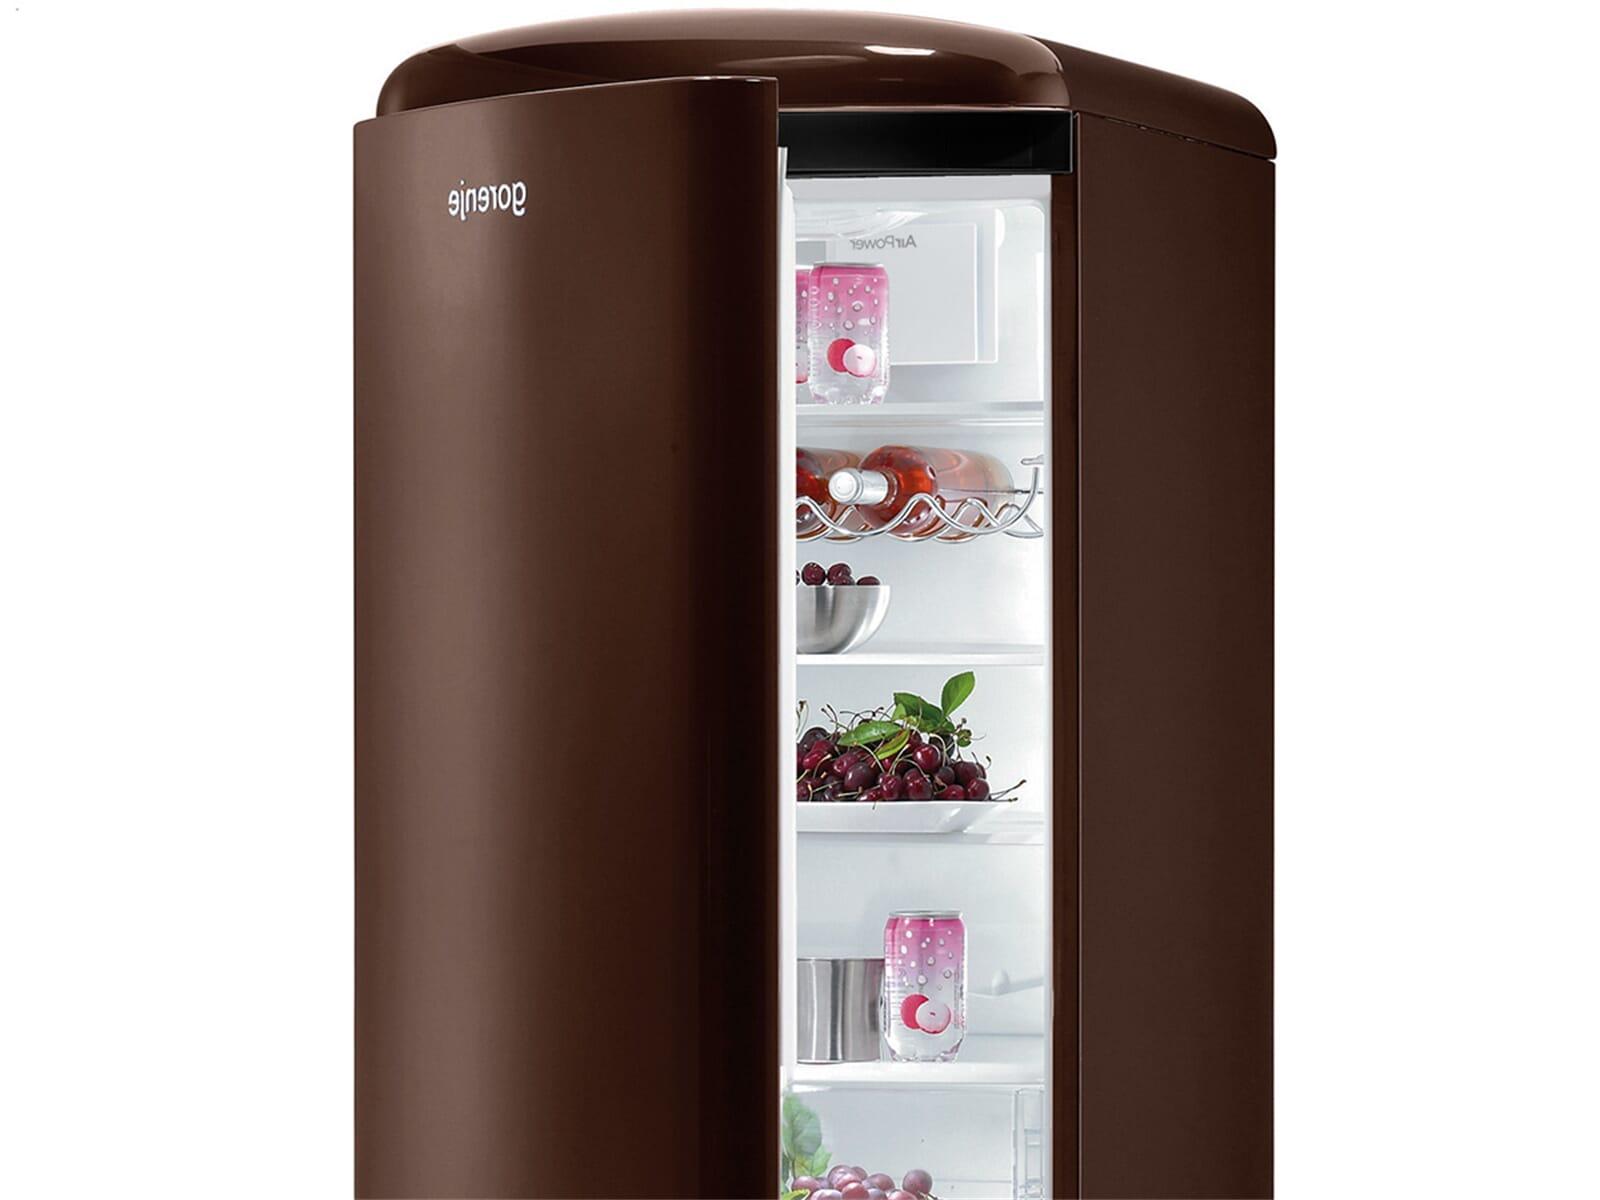 Gorenje Kühlschrank Kombi : Gorenje kühlschrank gefrierkombination cool kühlschränke gorenje